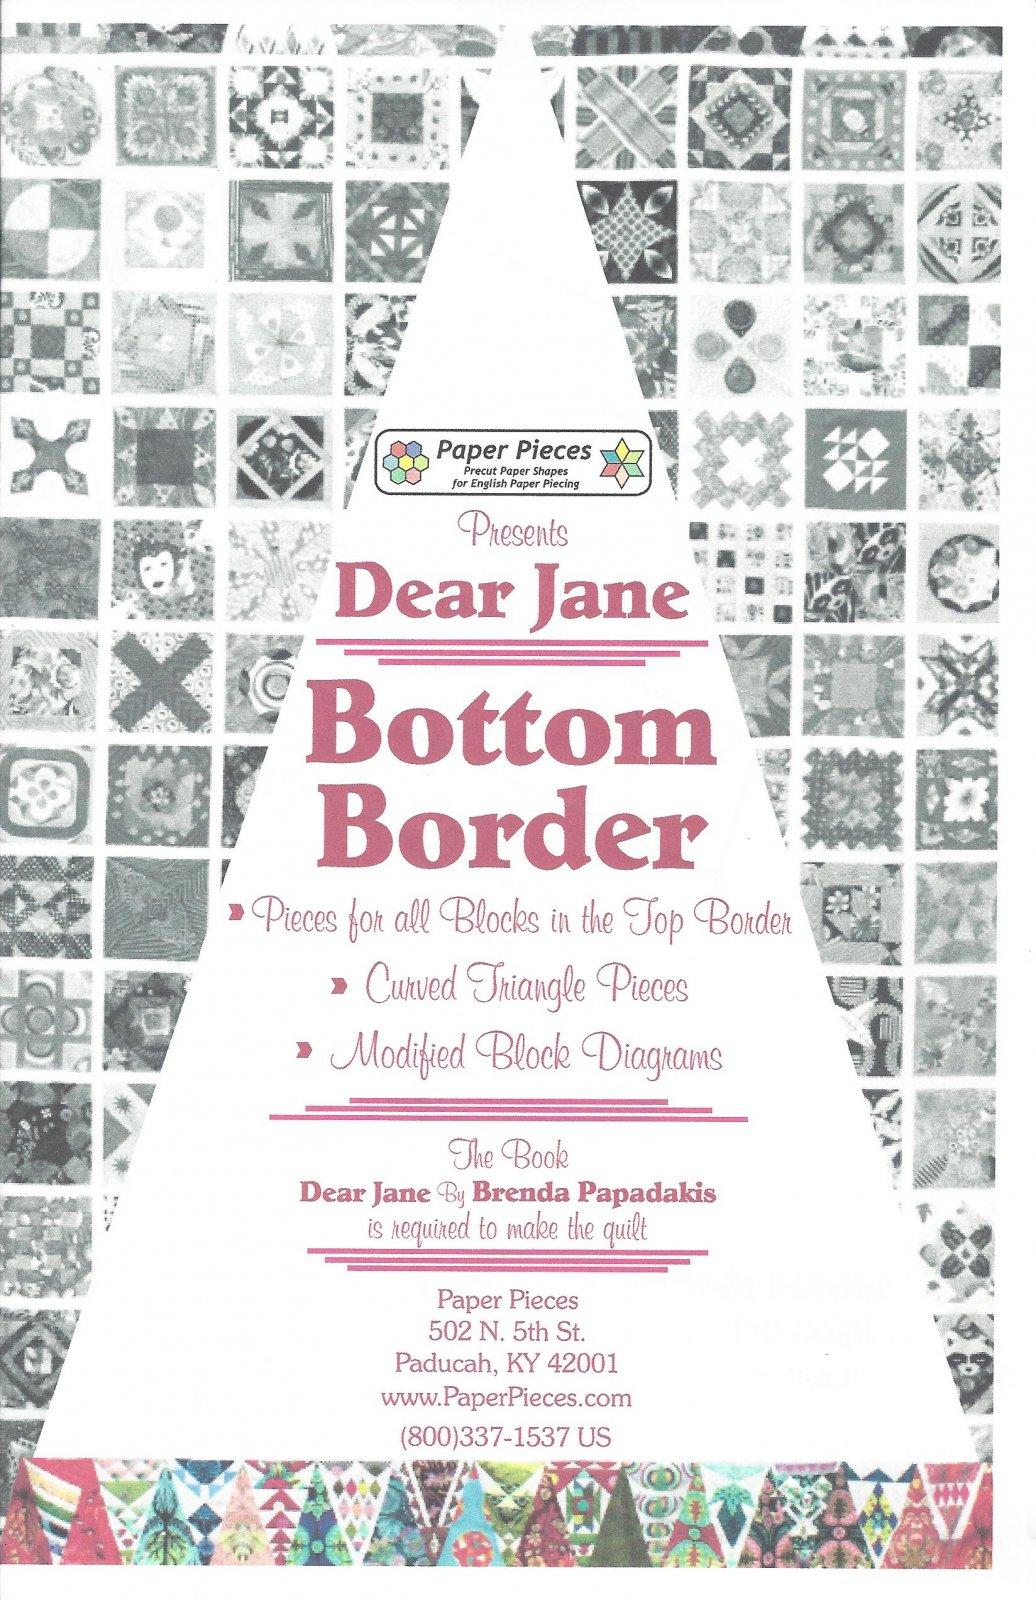 Dear Jane (Bottom Border) EPP Paper Pieces Kit